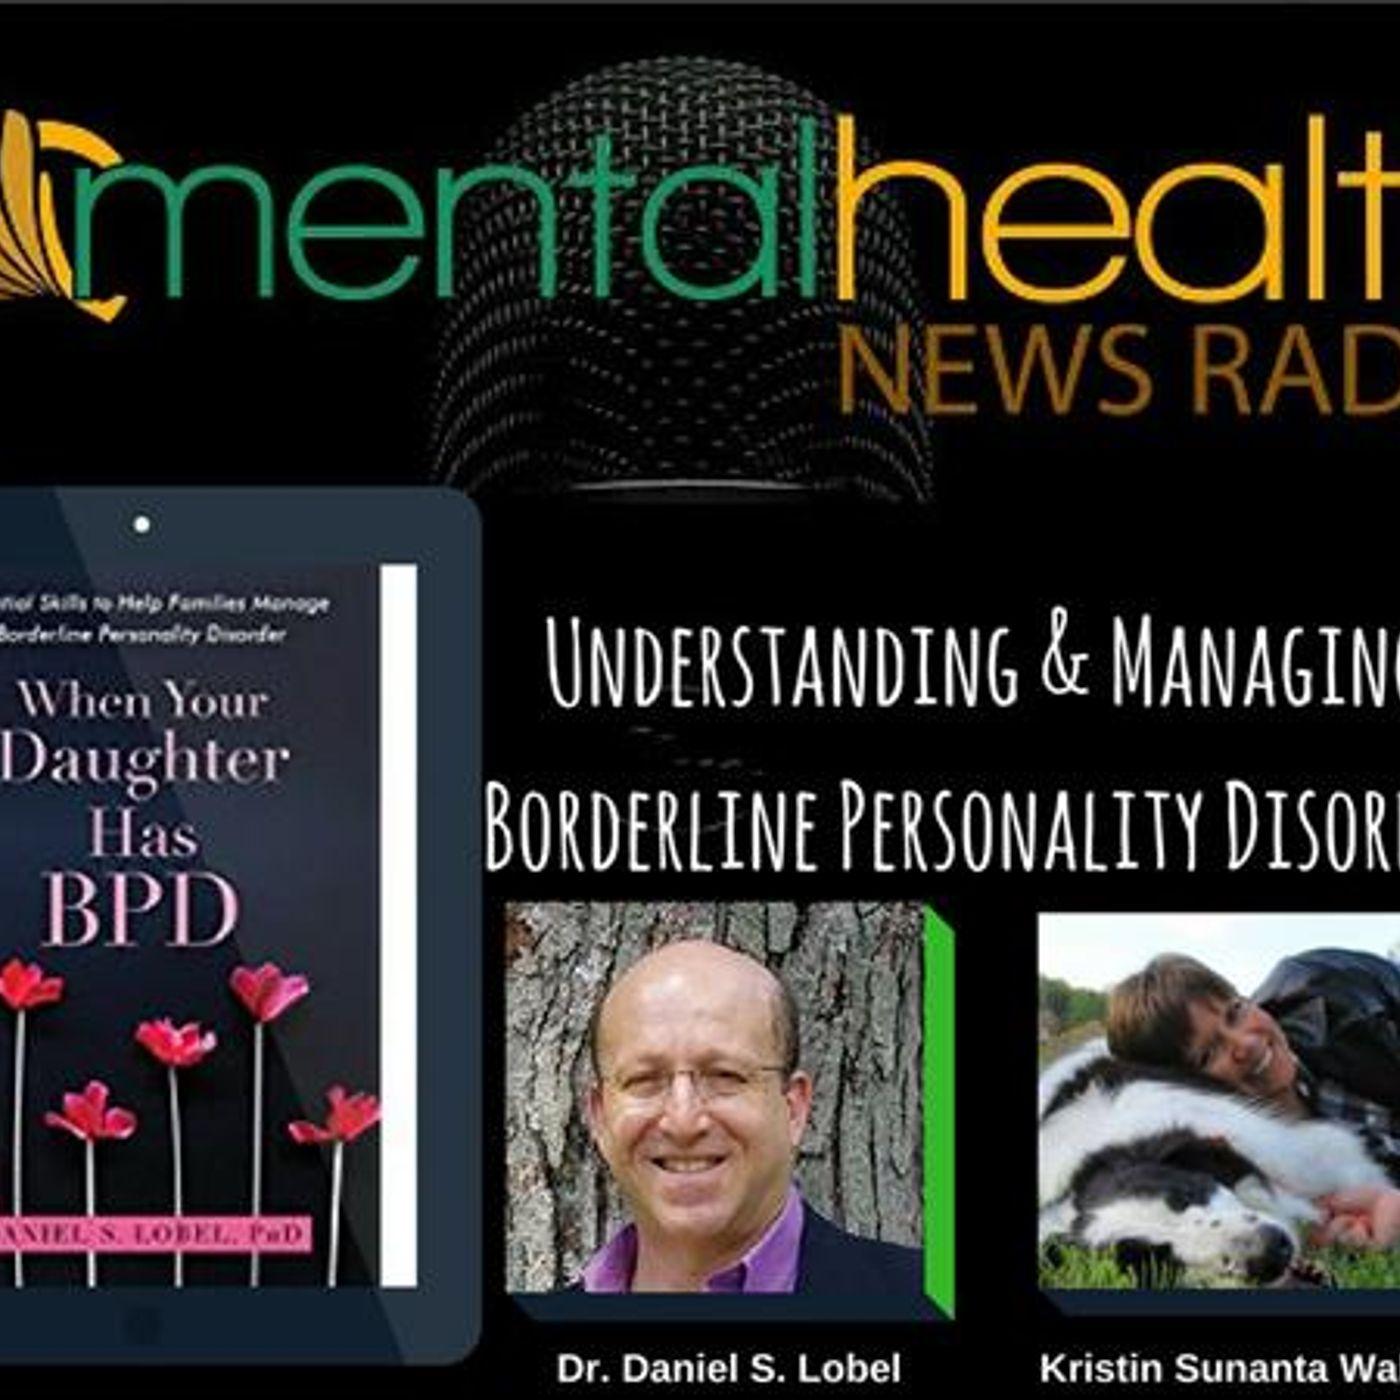 Mental Health News Radio - Understanding & Managing Borderline Personality Disorder: Dr. Daniel S. Lobel